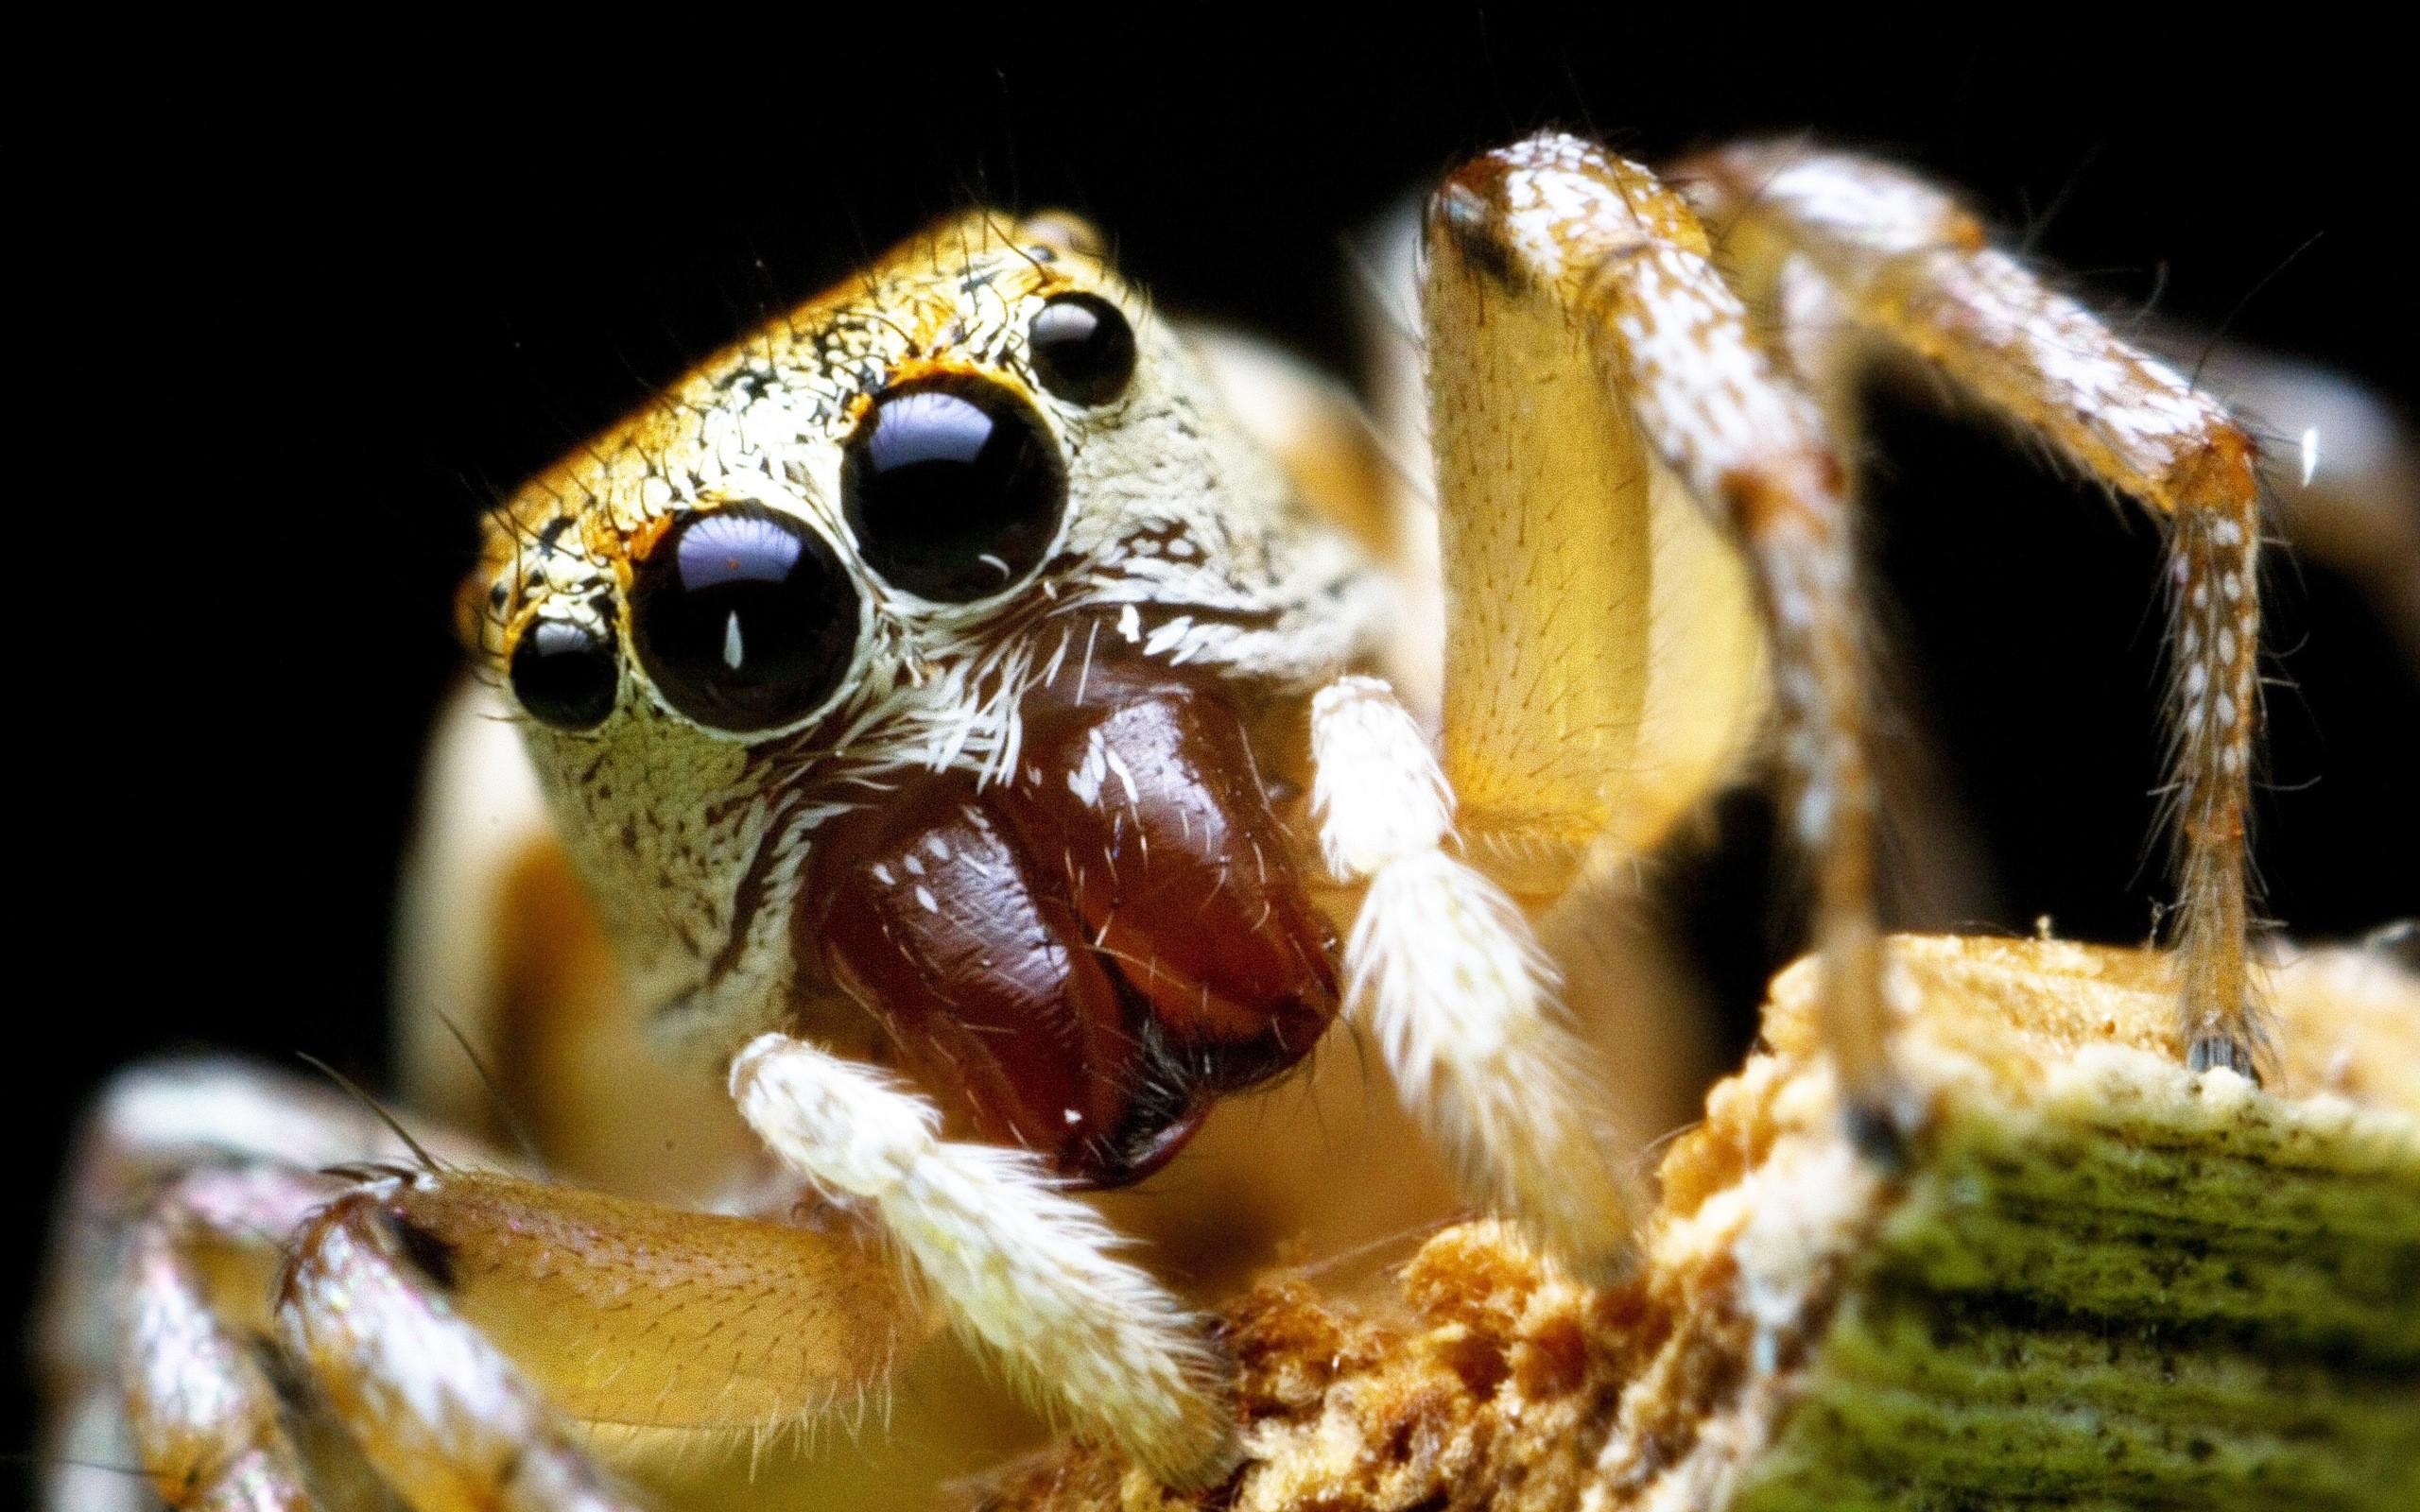 Spider Scary Eye Desktop Background. Download …